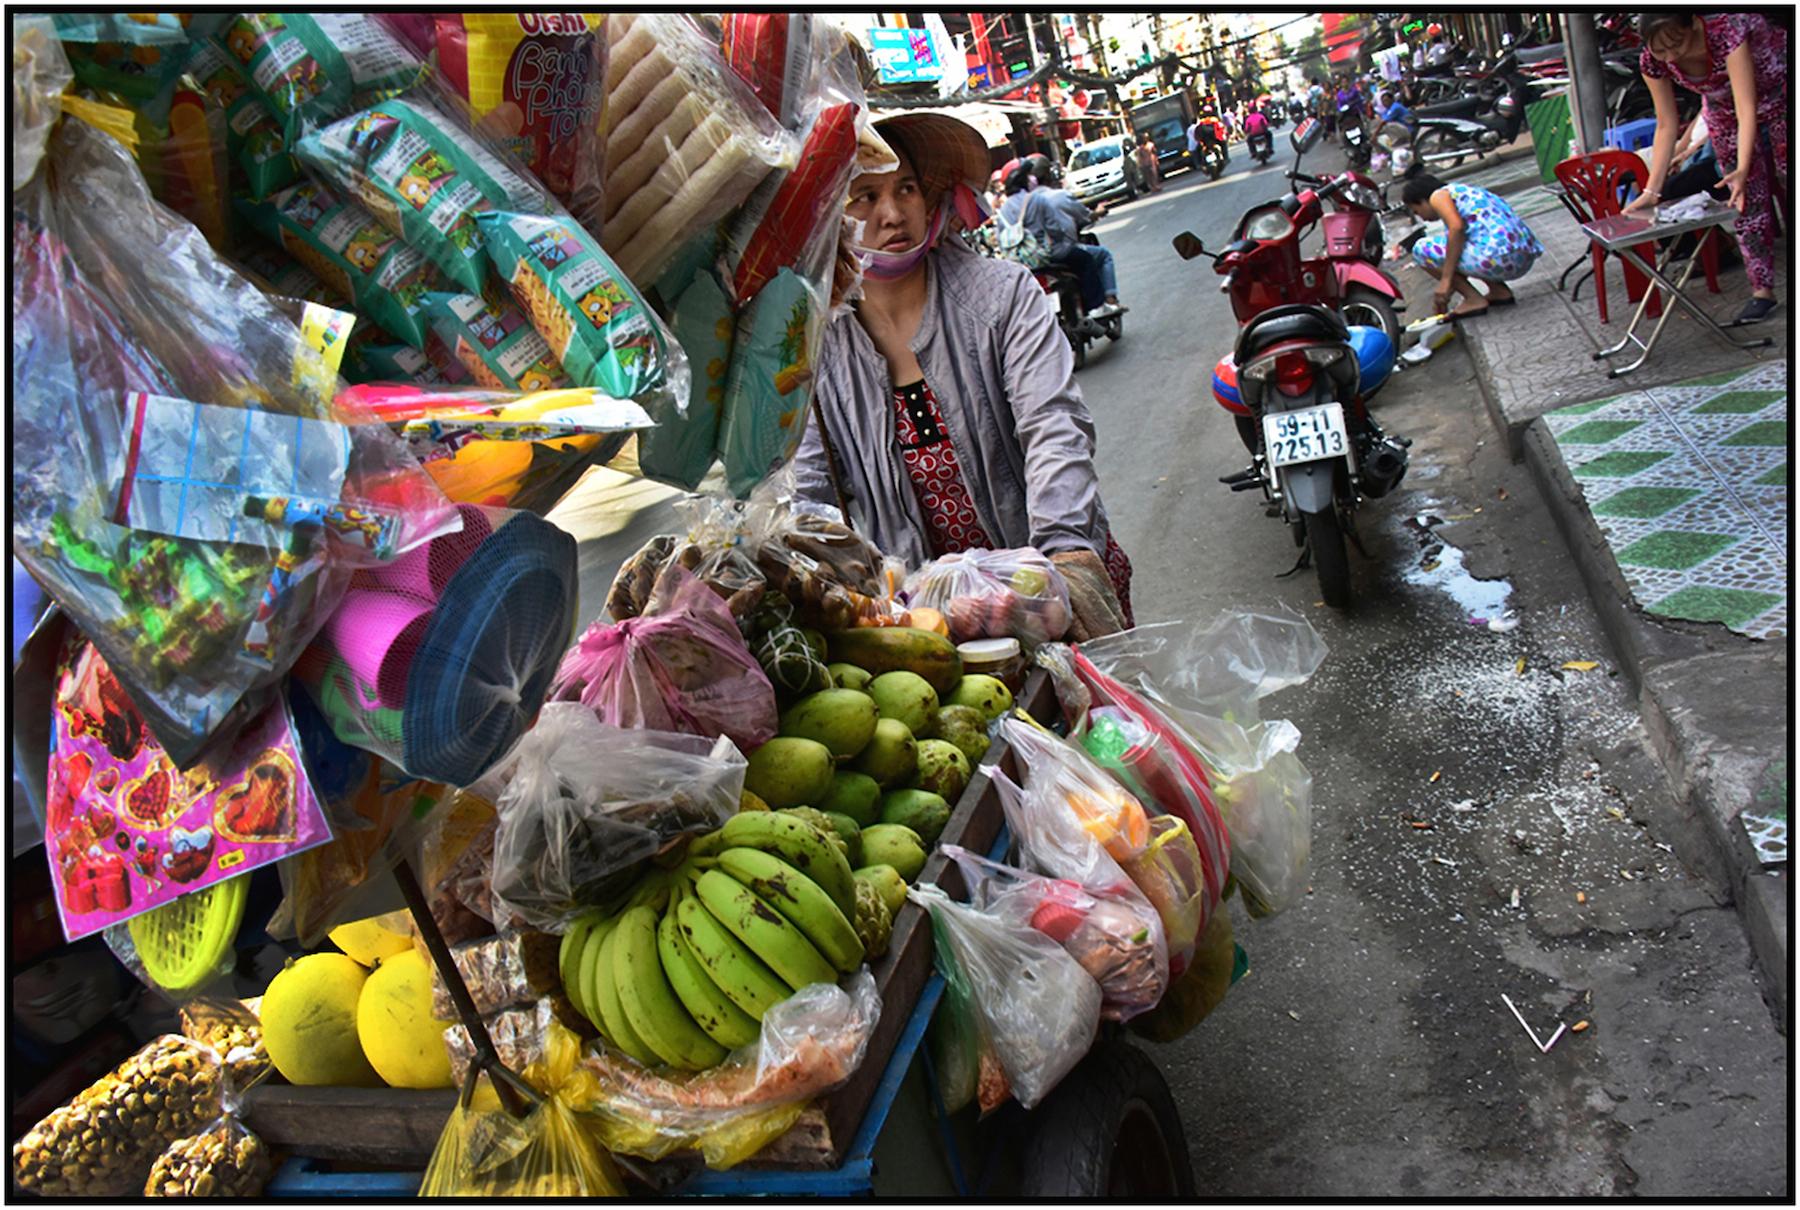 Vendor, Bui Vien Street, Saigon/HCMC, Dec. 2015. #3517